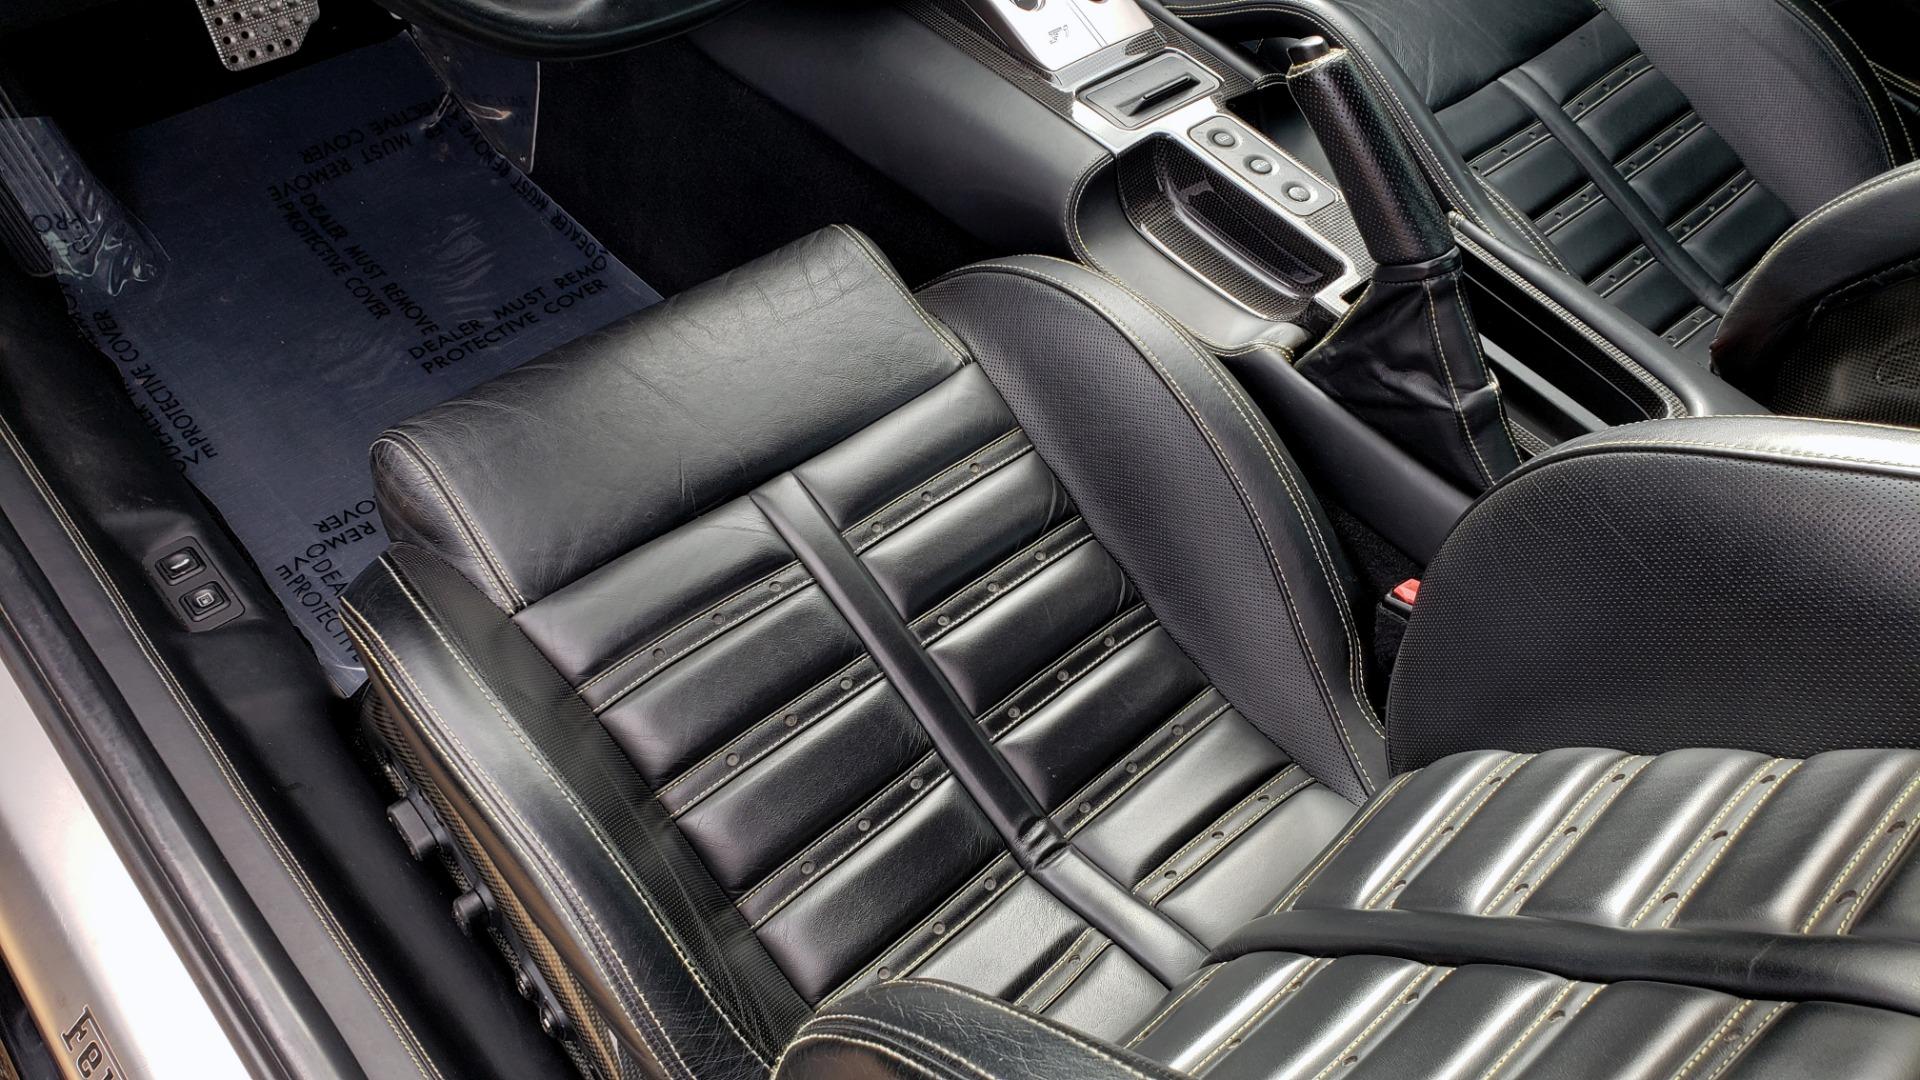 Used 2007 Ferrari 599 GTB FIORANO HGTE / V12 / F1 TRANS / NAV / BOSE / CUSTOM WHEELS for sale $109,999 at Formula Imports in Charlotte NC 28227 32